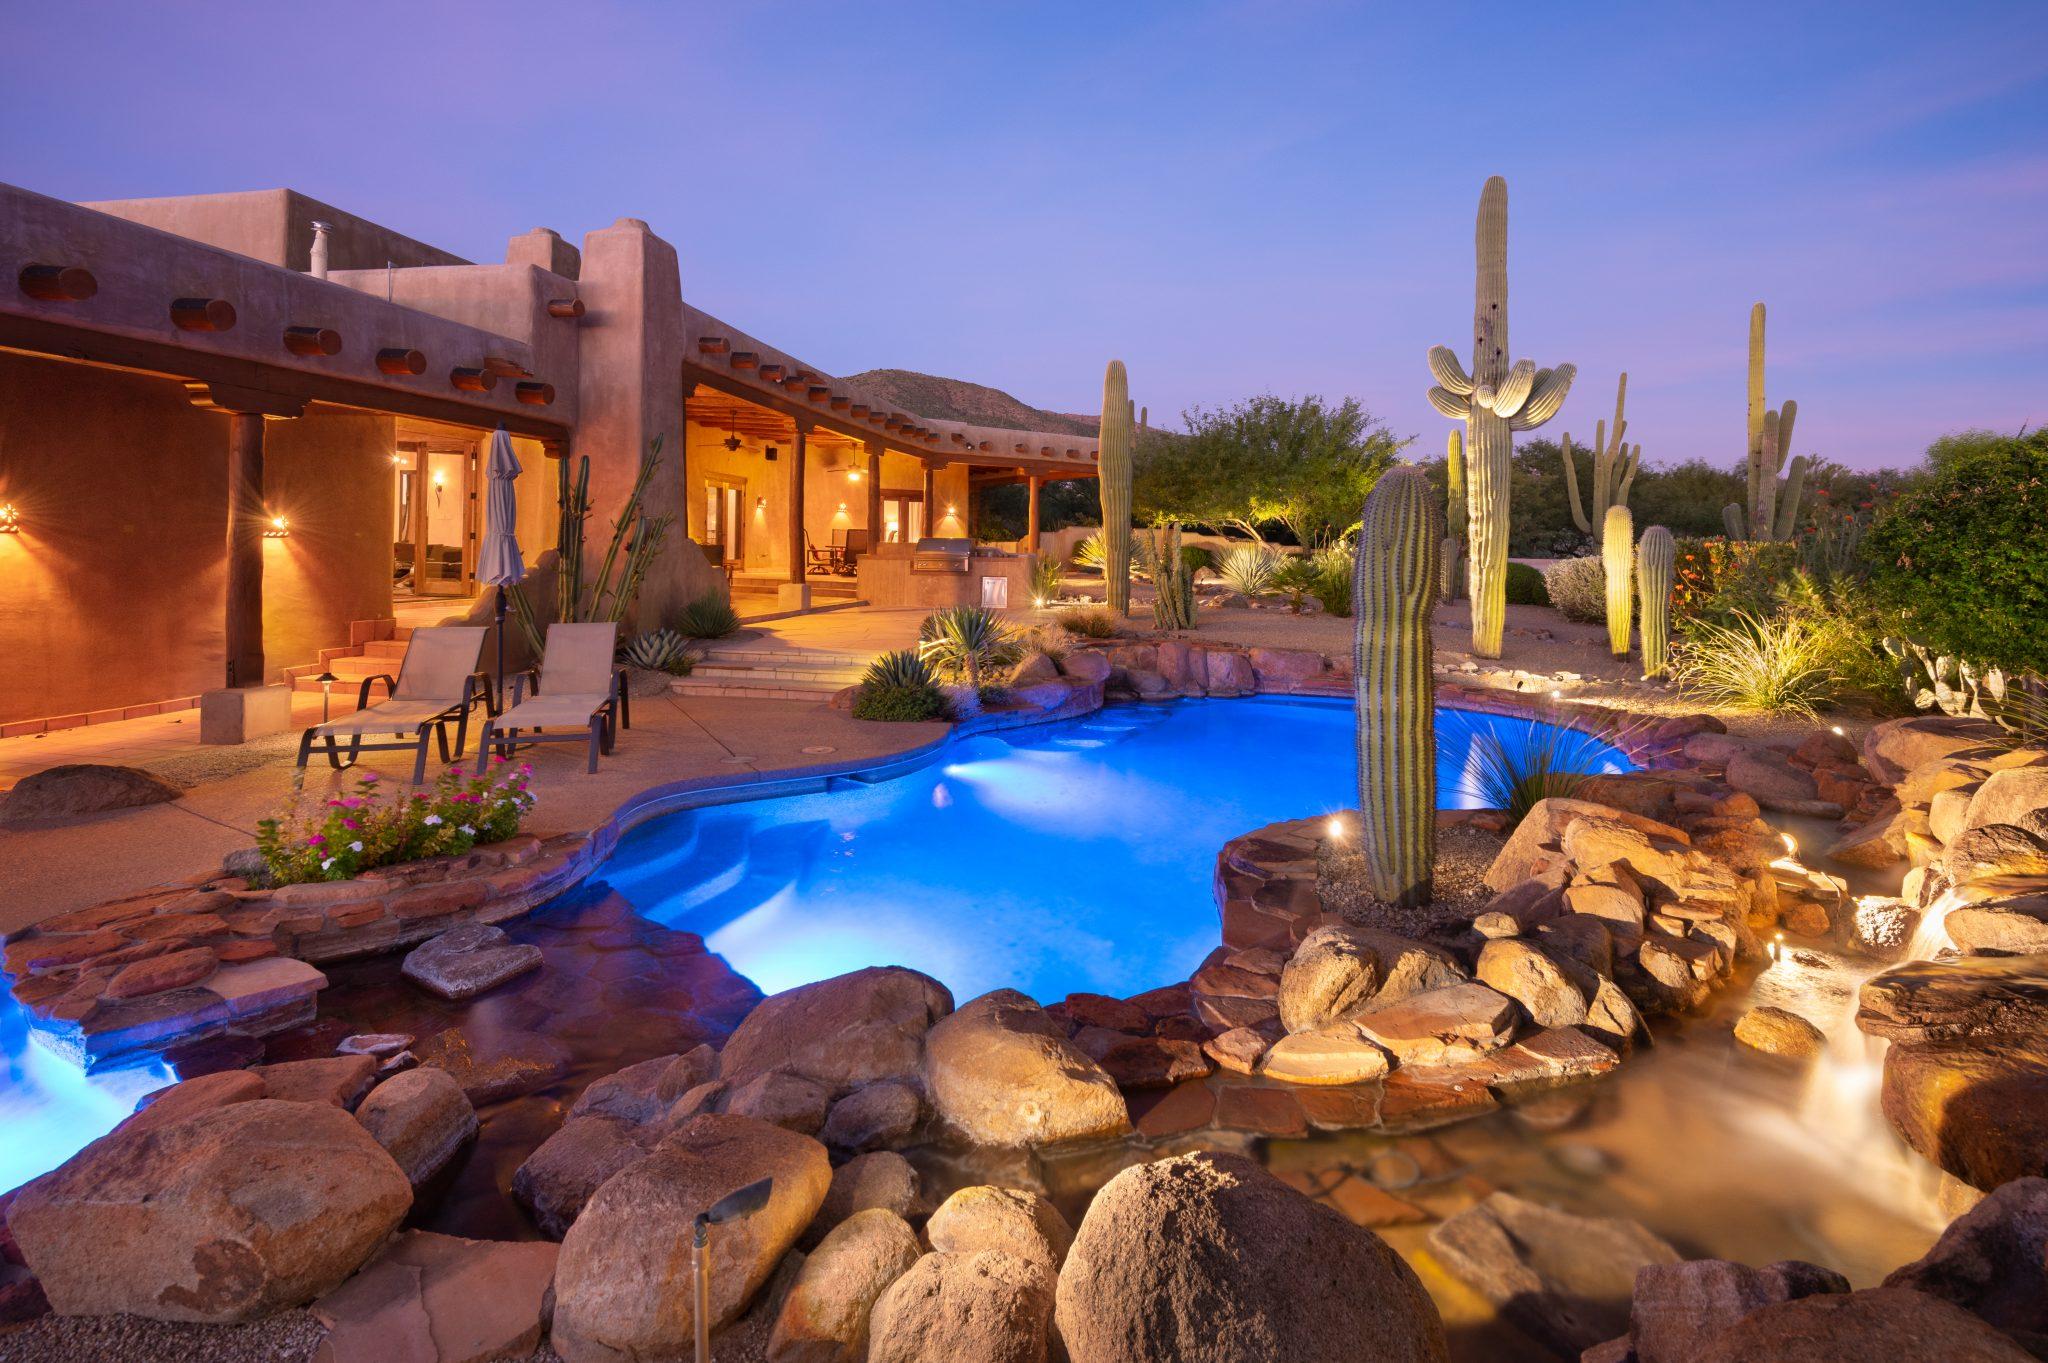 NE Tucson Ray Birch Santa Fe Home